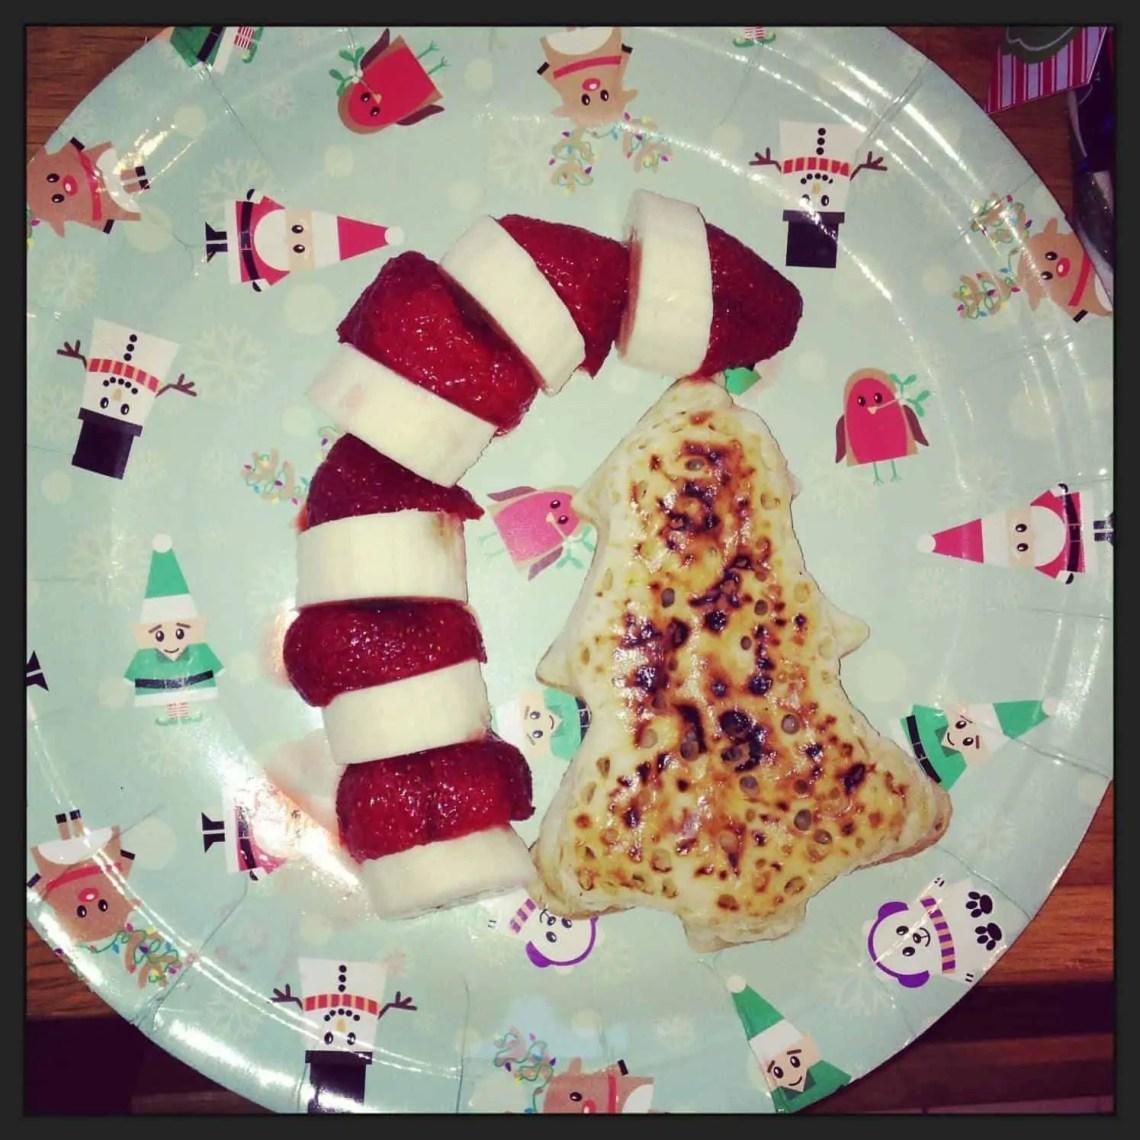 North Pole Breakfast Strawberry and Banana sleigh